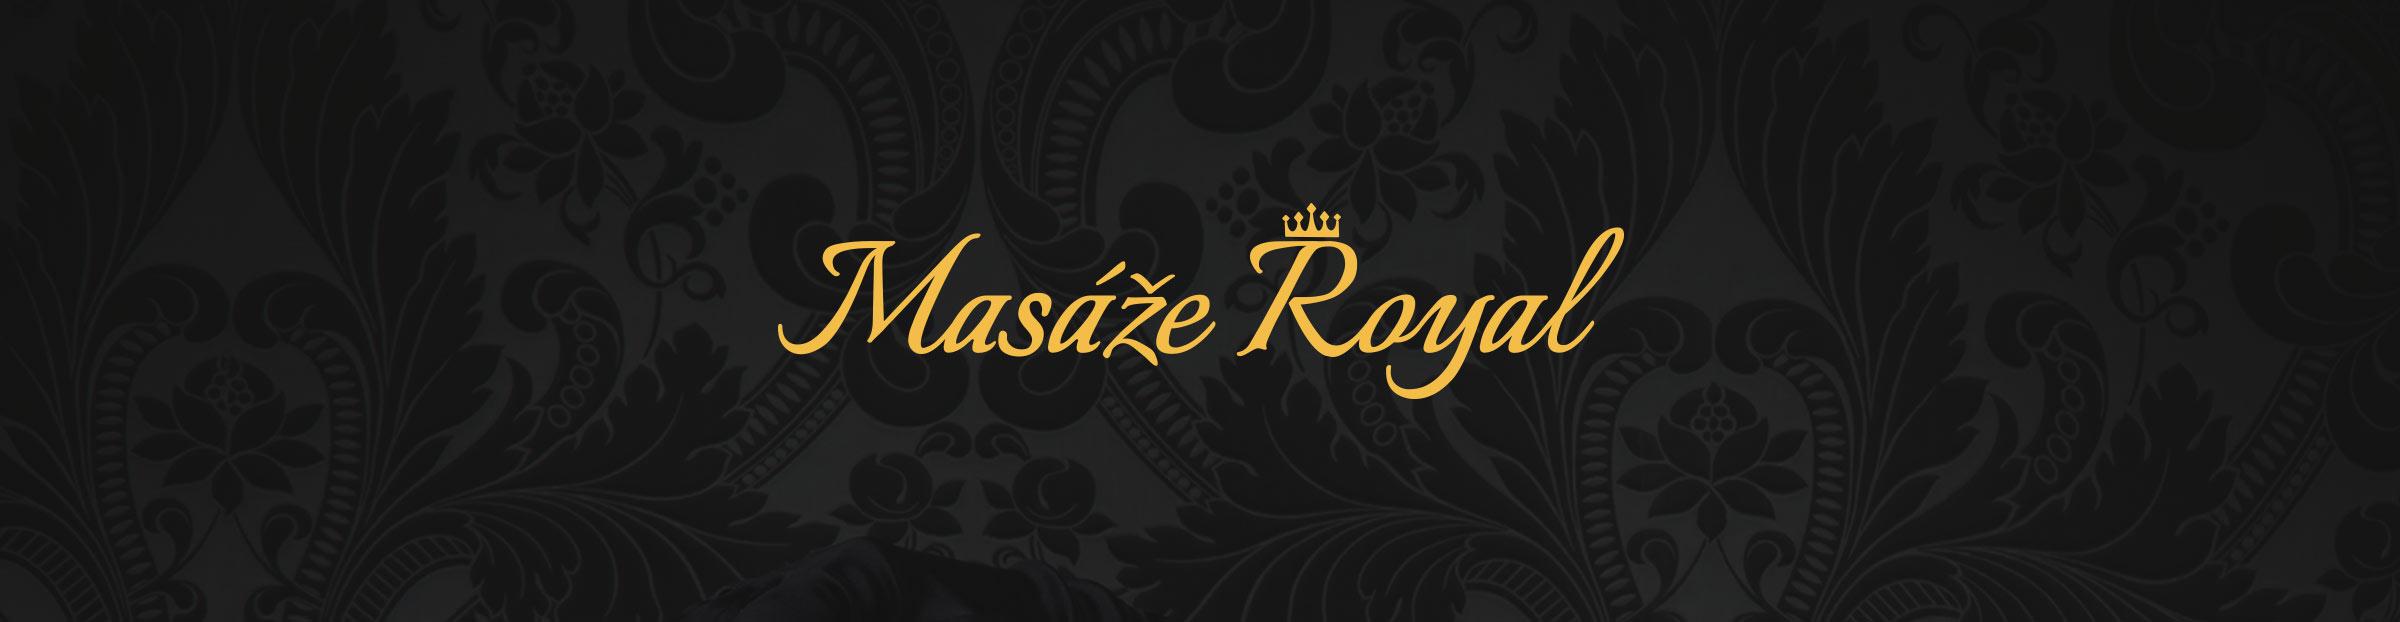 Logo pro Masáže Royal